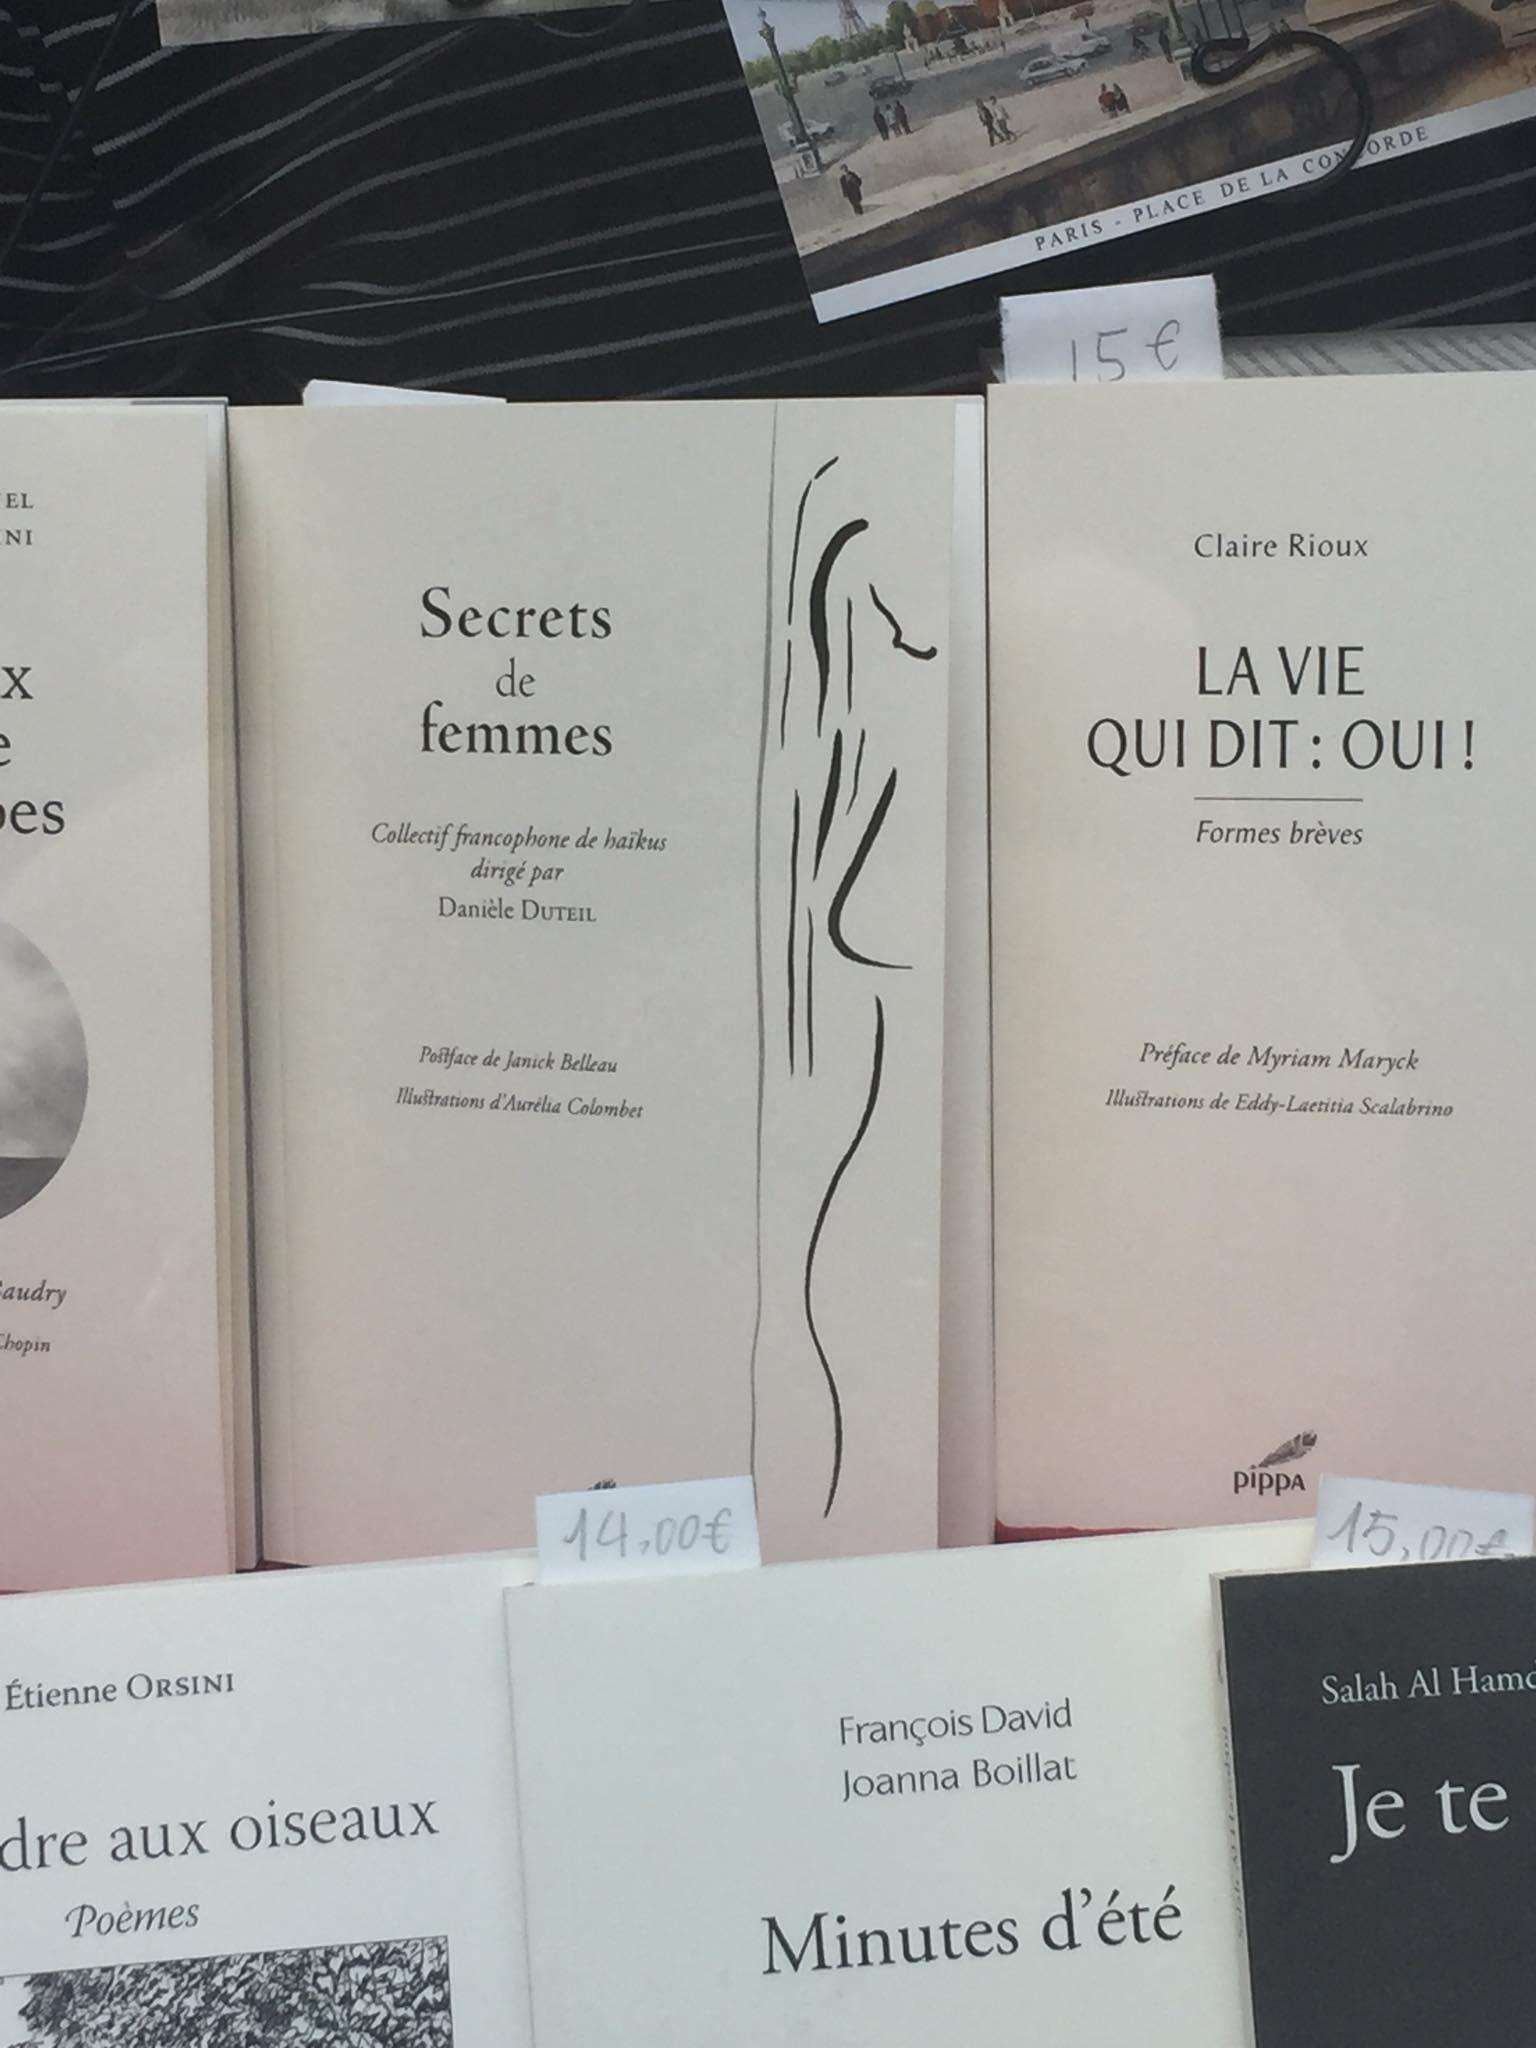 Secrets de femmes en rayon